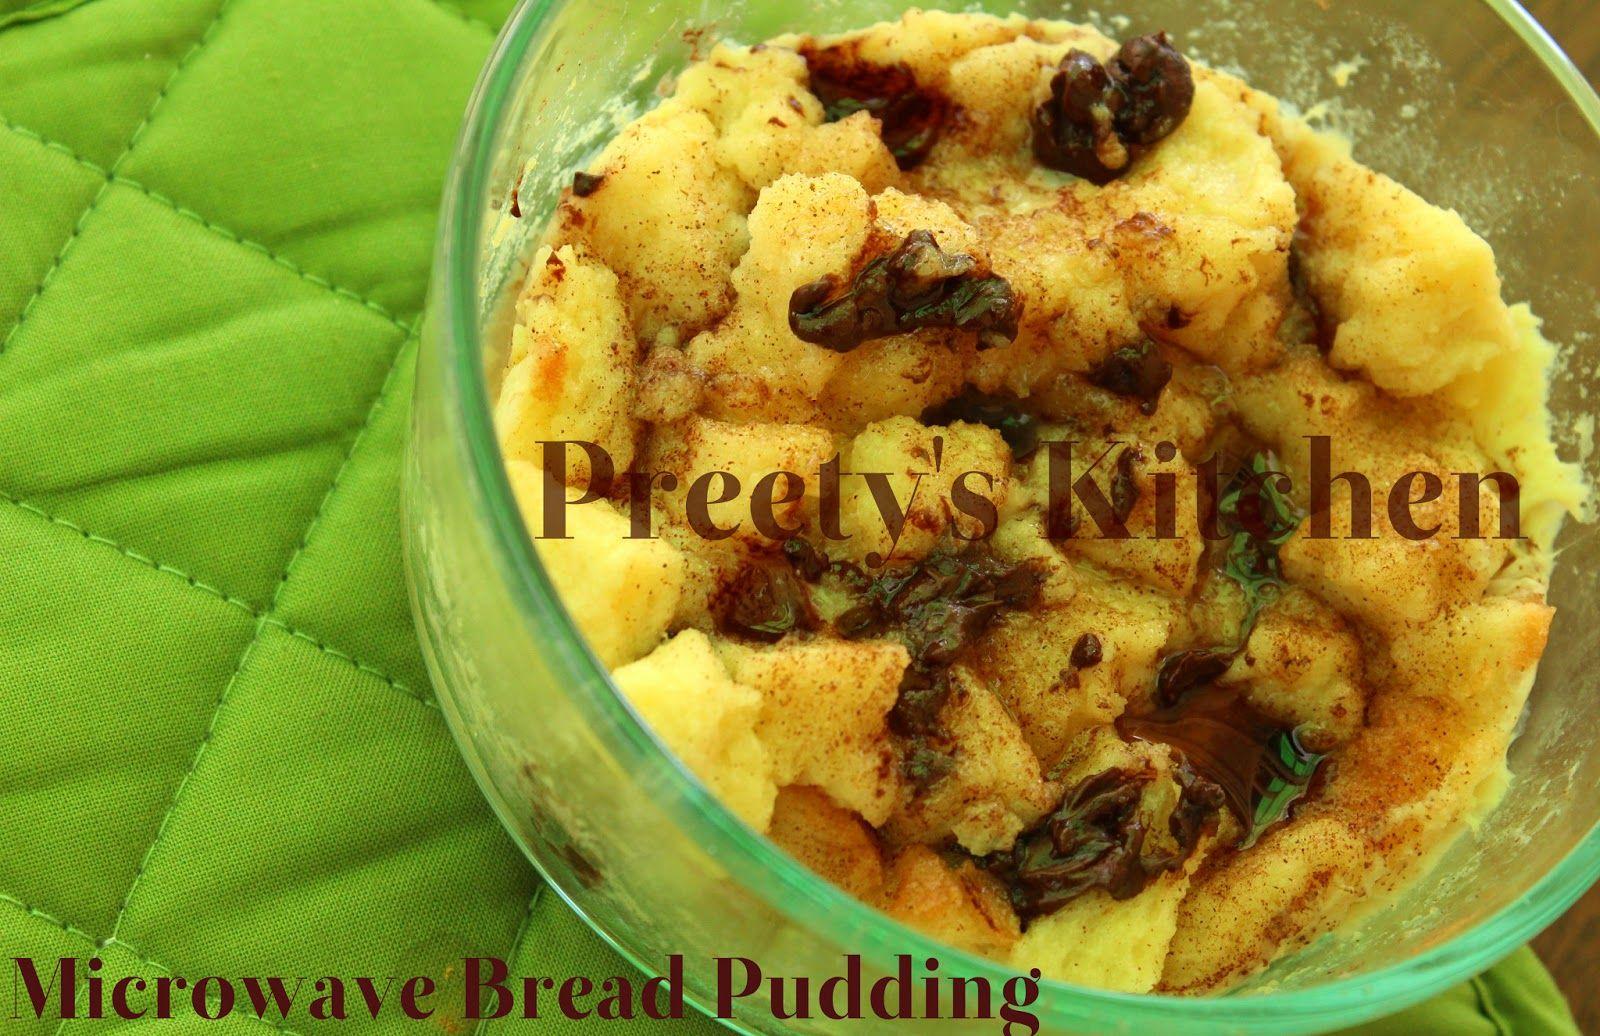 Preety's Kitchen: Microwave Bread Pudding (Single Serving Dessert)